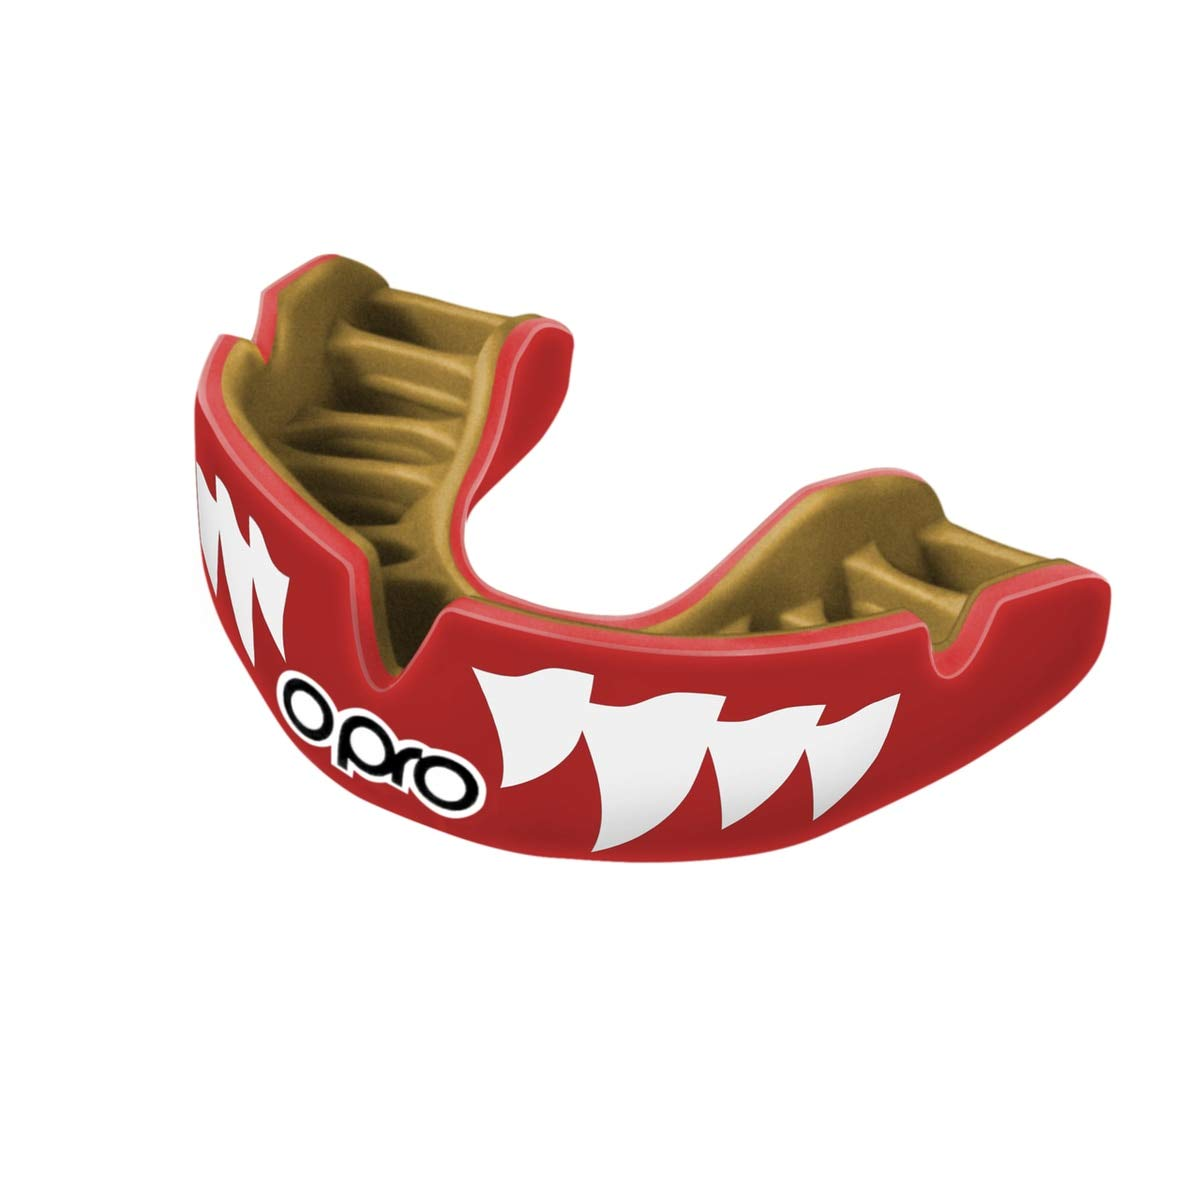 Opro Opro Opro Power Fit Aggression Jaws Mouthguard rot Gold B07GC9H671 Brustschützer Günstigstes 81f127